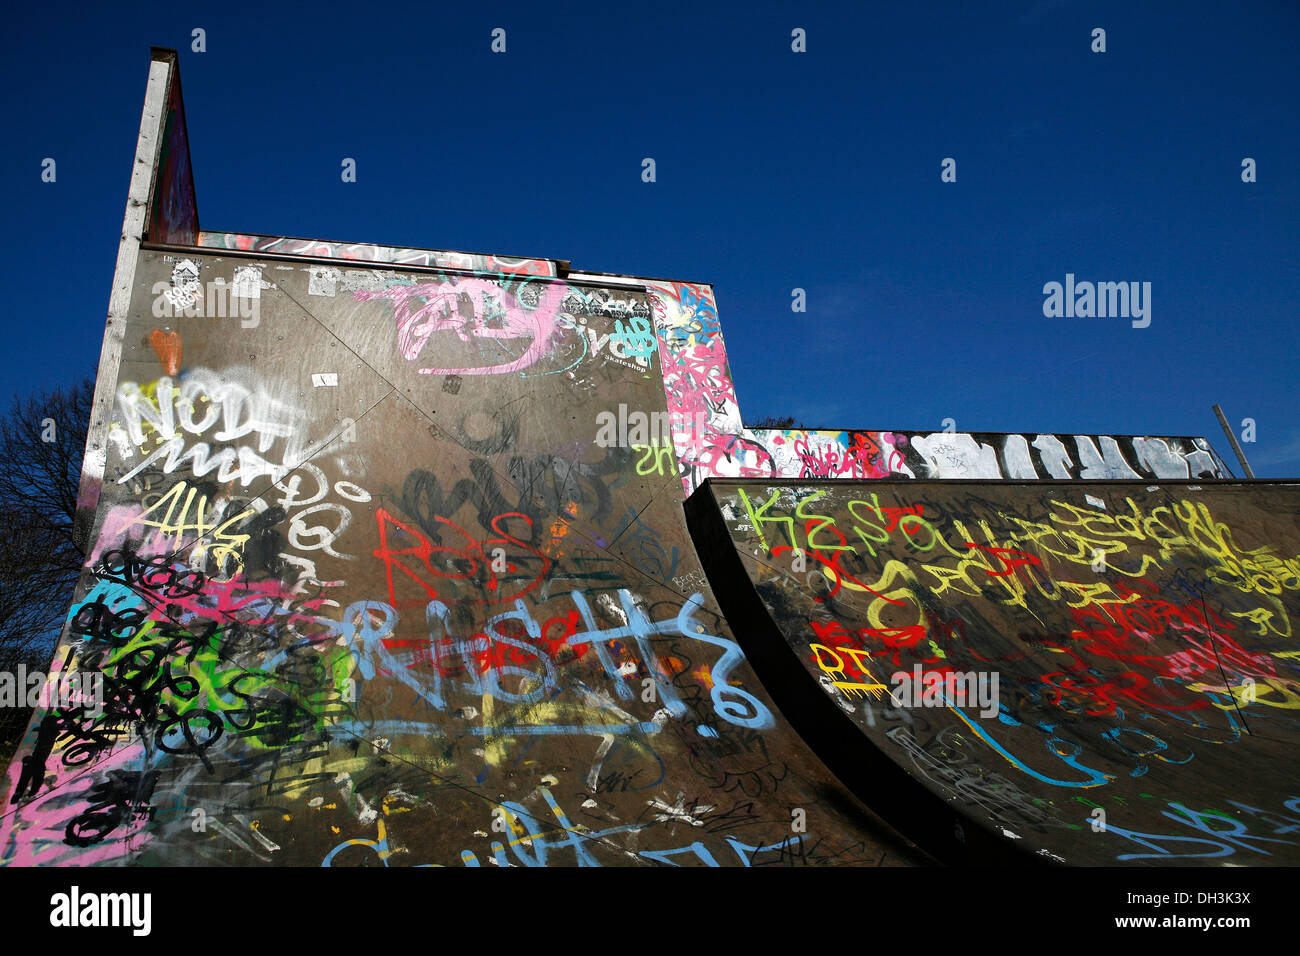 Skate park, halfpipe covered in graffiti, green belt of Cologne-Nippes, Cologne, North Rhine-Westphalia Stock Photo